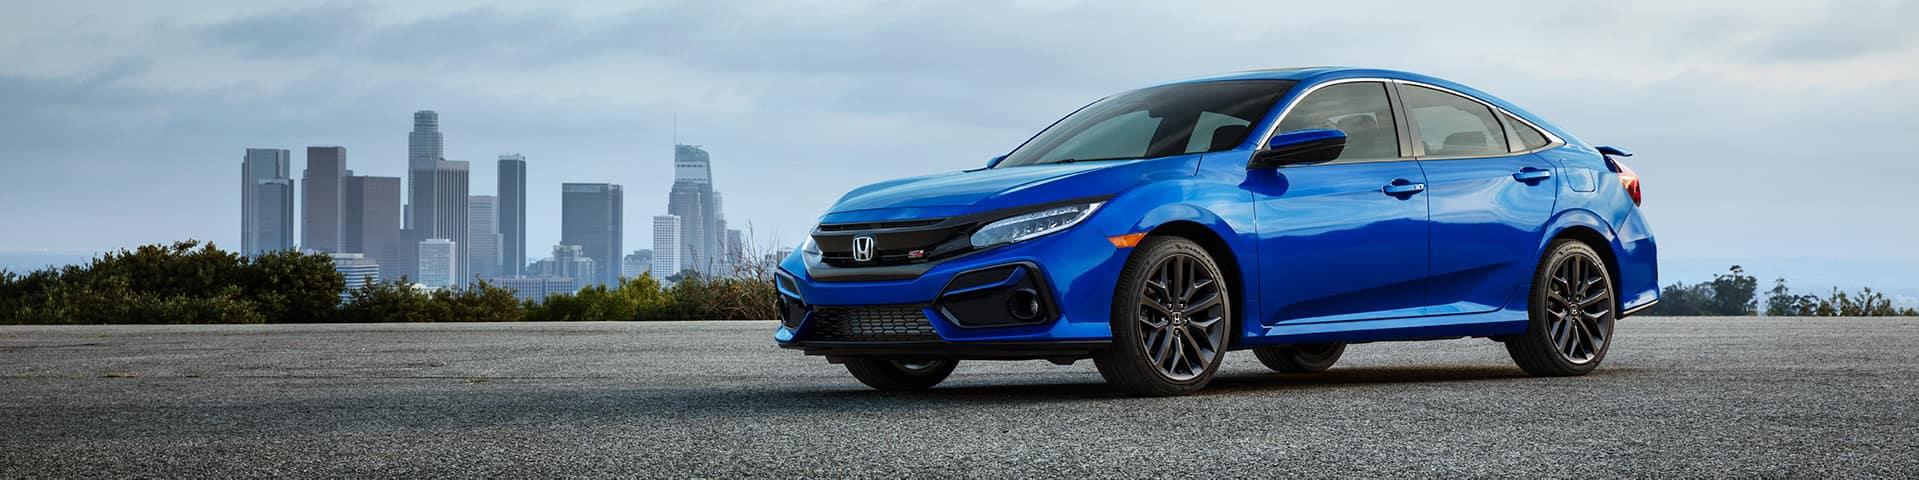 Boch Honda is a Car Dealership near Westwood MA | Blue MY20 Honda Civic Sedan parked outside city